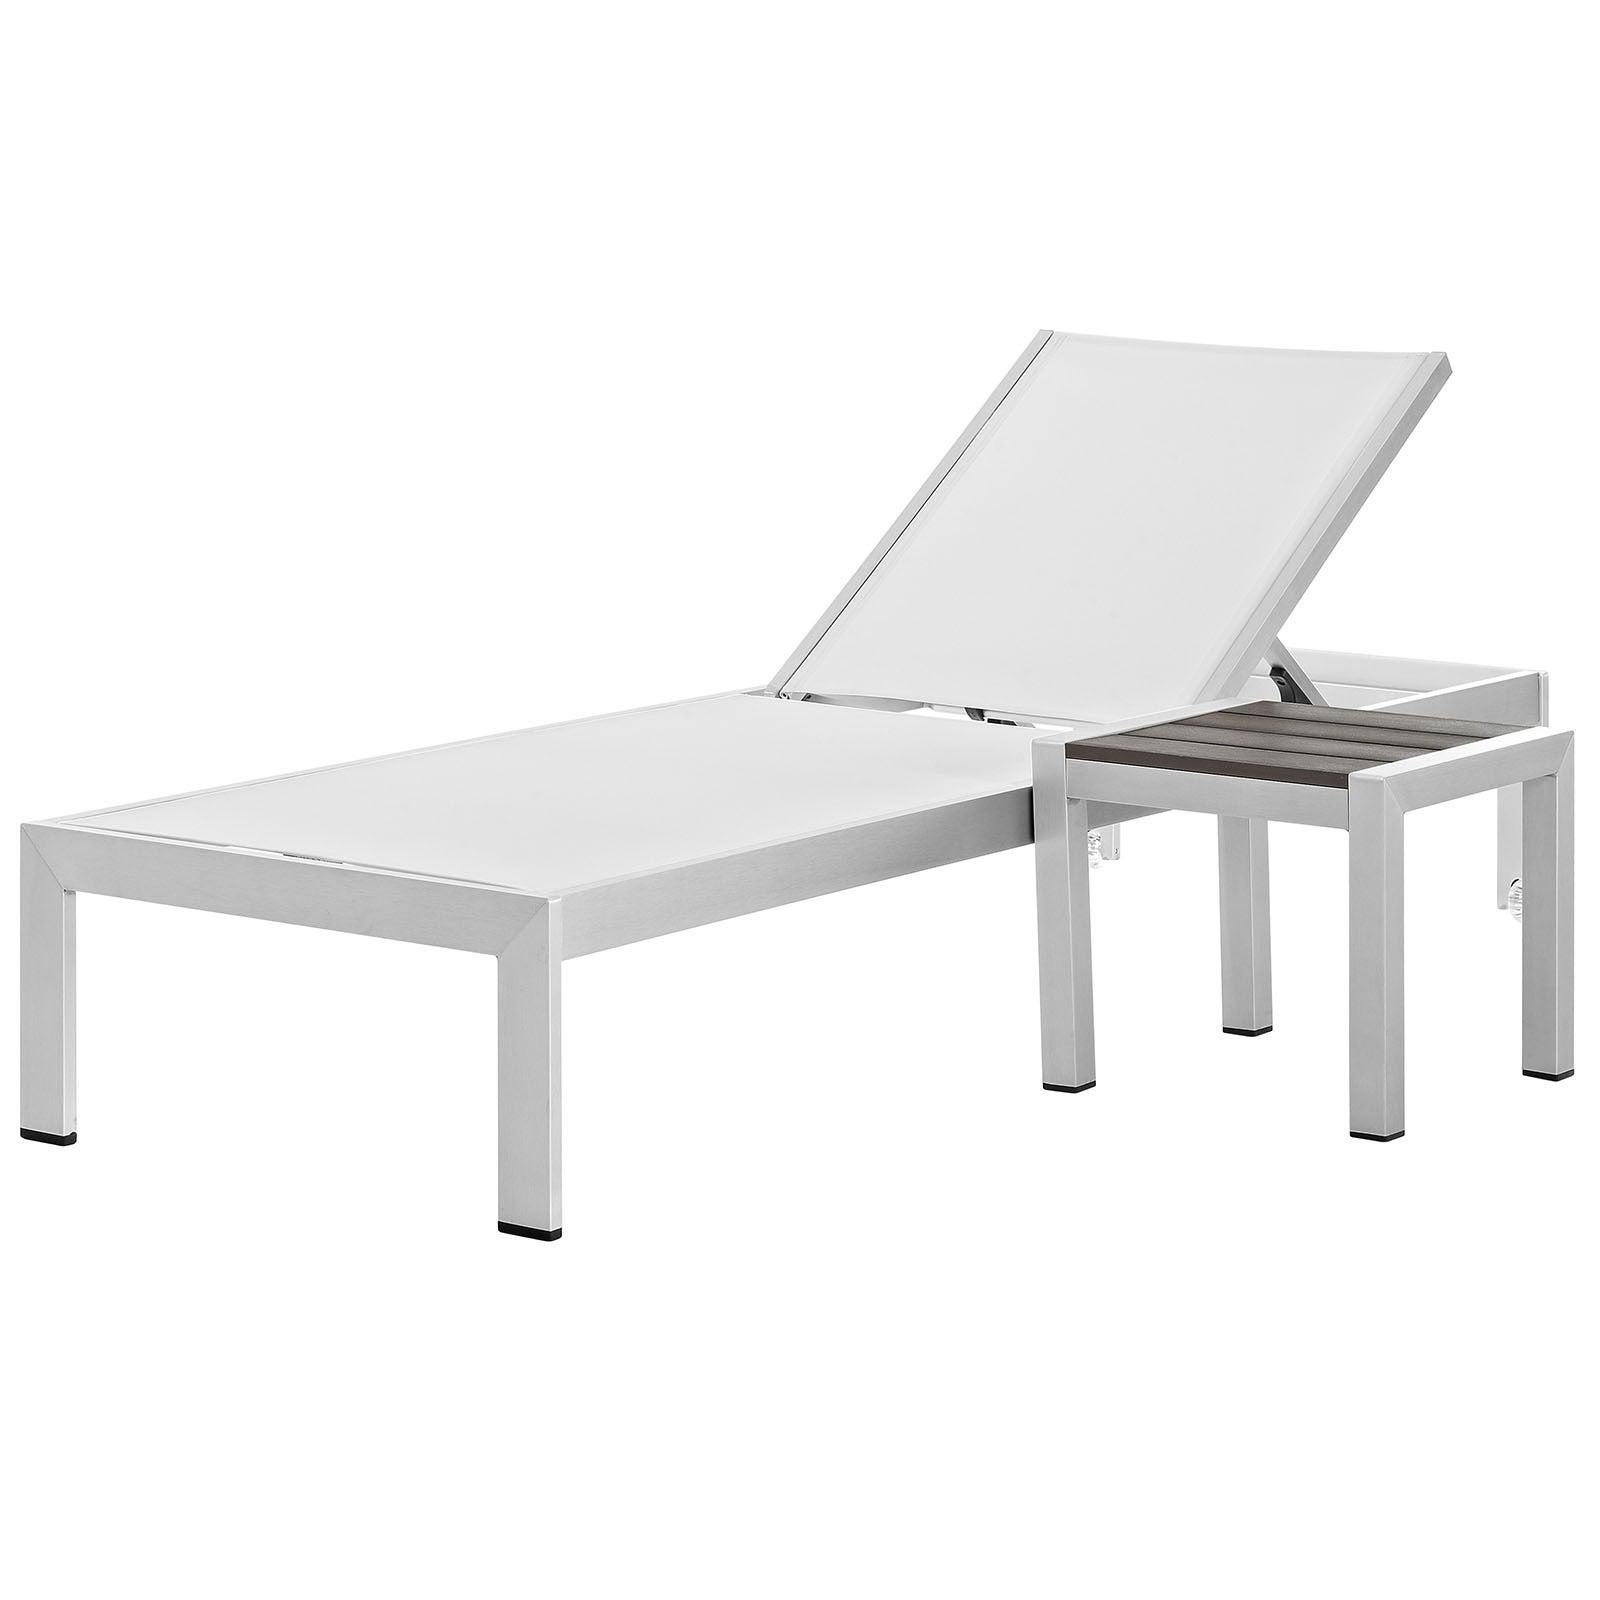 Fashionable Shore Aluminum Outdoor Chaise Set Of 2 Inside Shore Aluminum Outdoor Chaise Lounges (View 14 of 25)